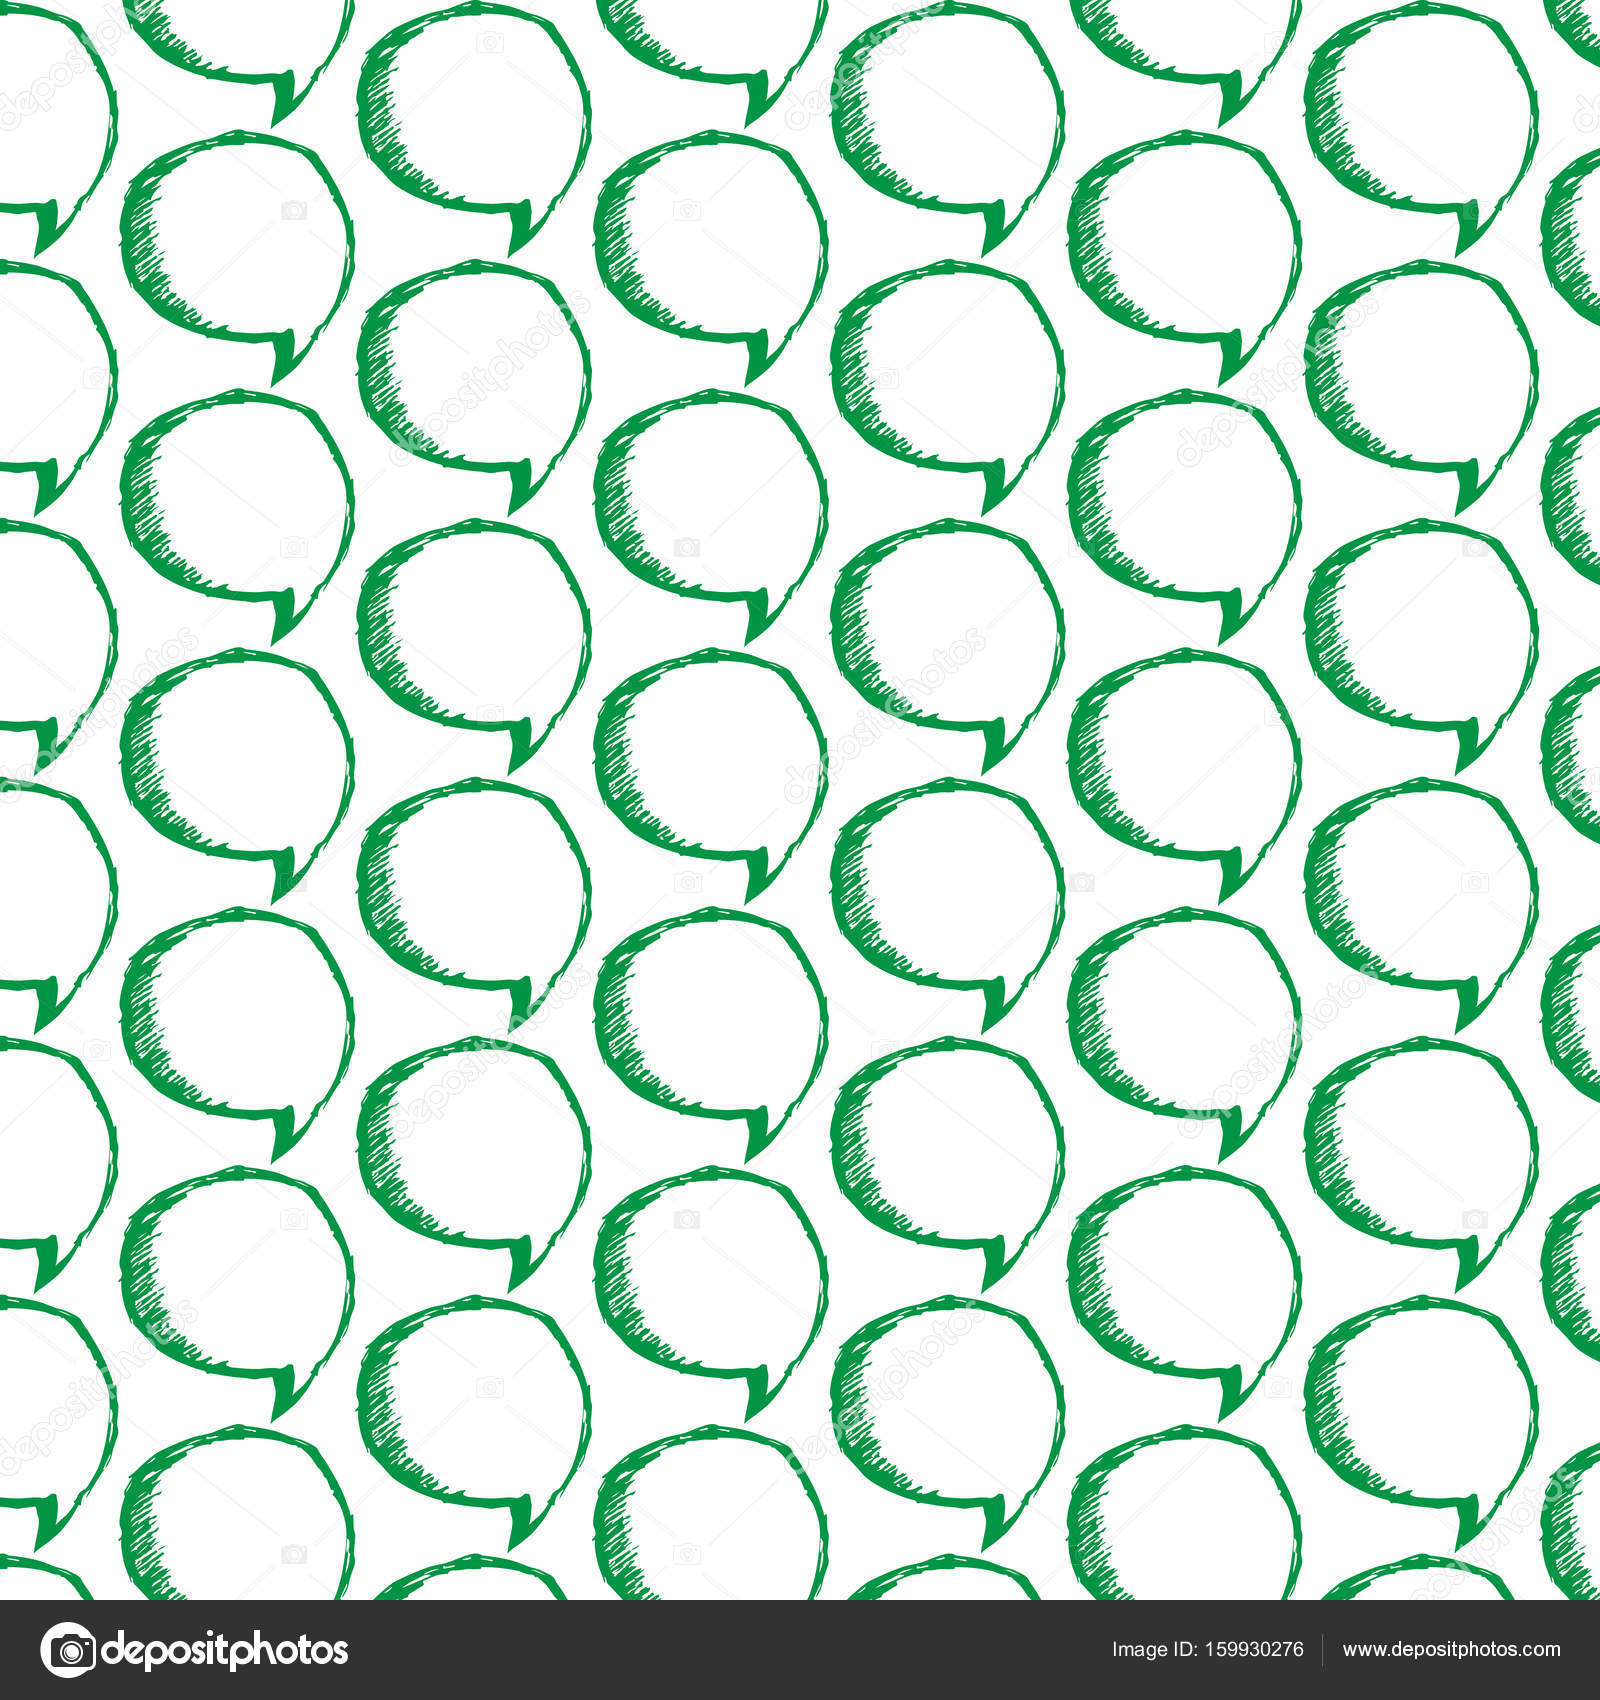 rede blasen muster stockvektor - Hochzeitsrede Muster